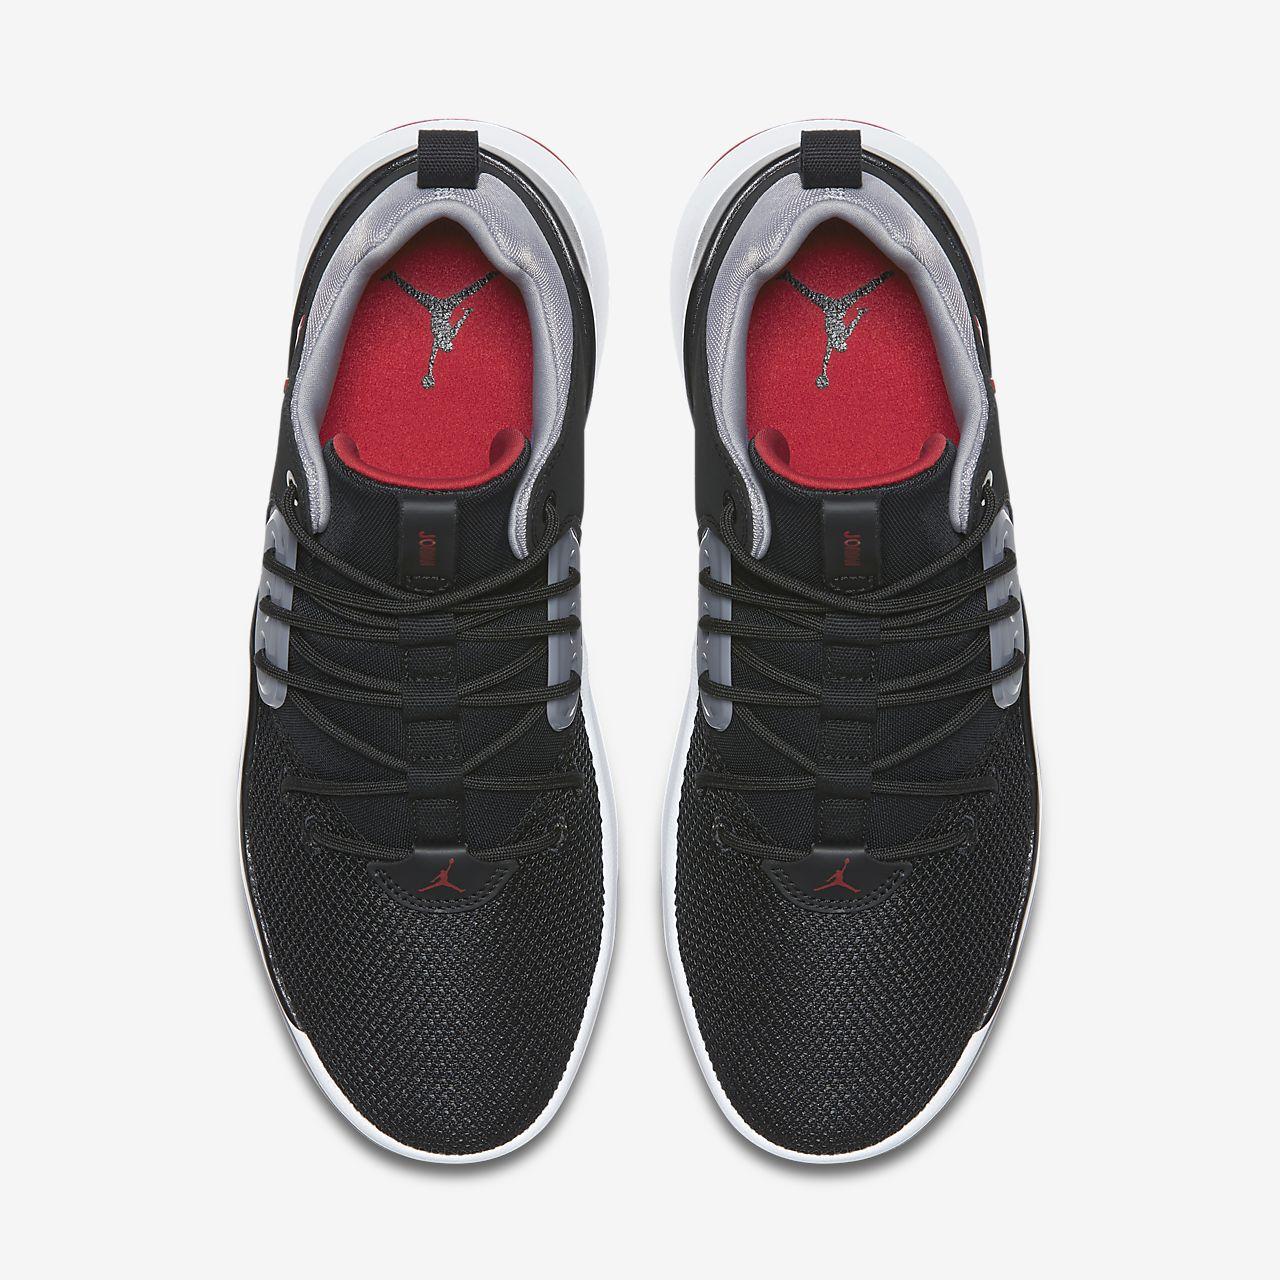 791a346de1c Low Resolution Jordan DNA Men s Shoe Jordan DNA Men s Shoe